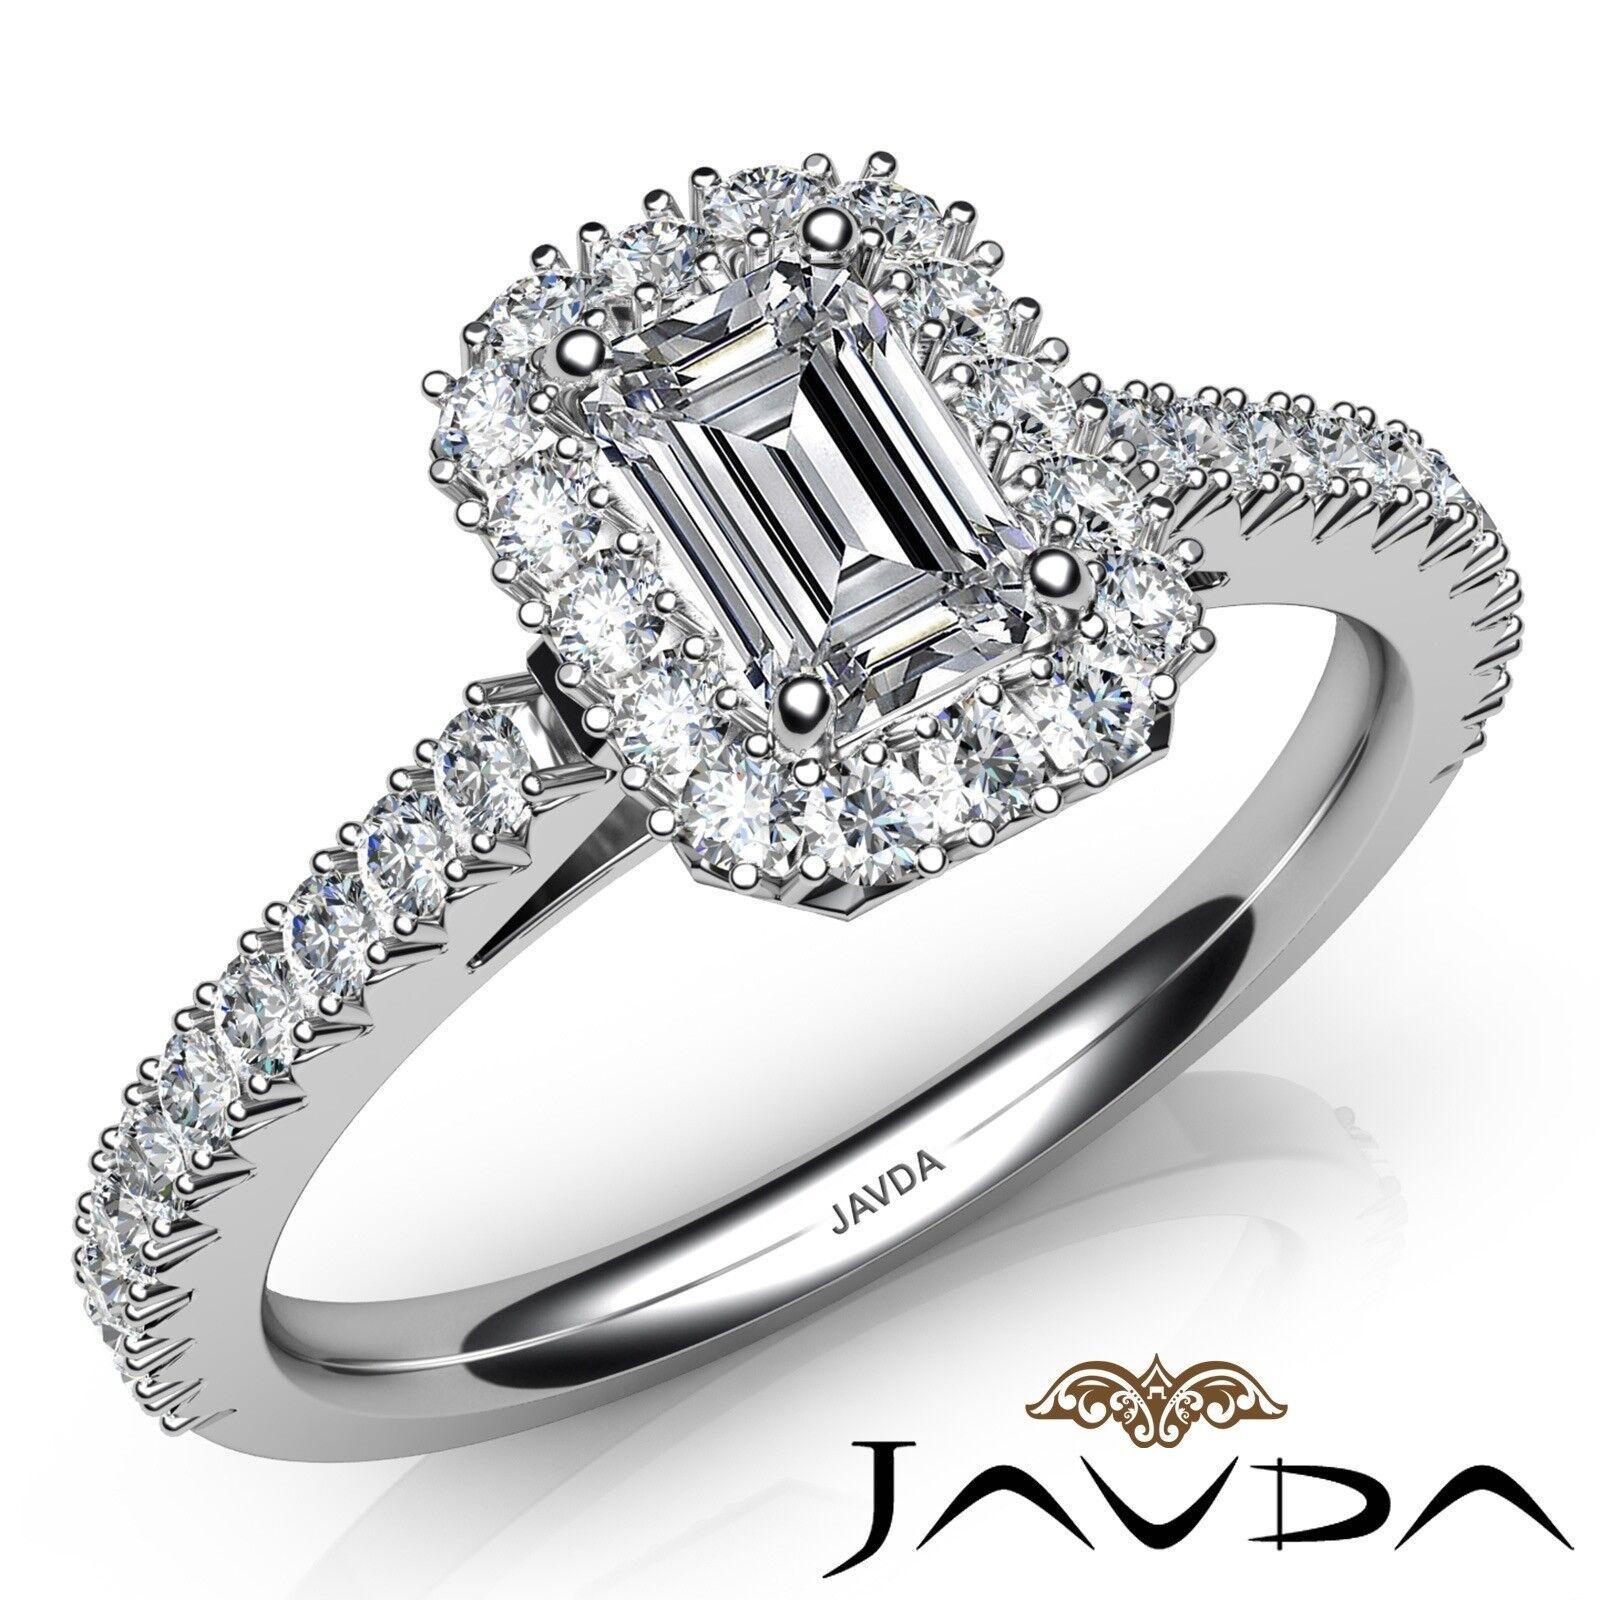 1.94ct French Pave Halo Sidestone Emerald Diamond Engagement Ring GIA I-SI1 Gold